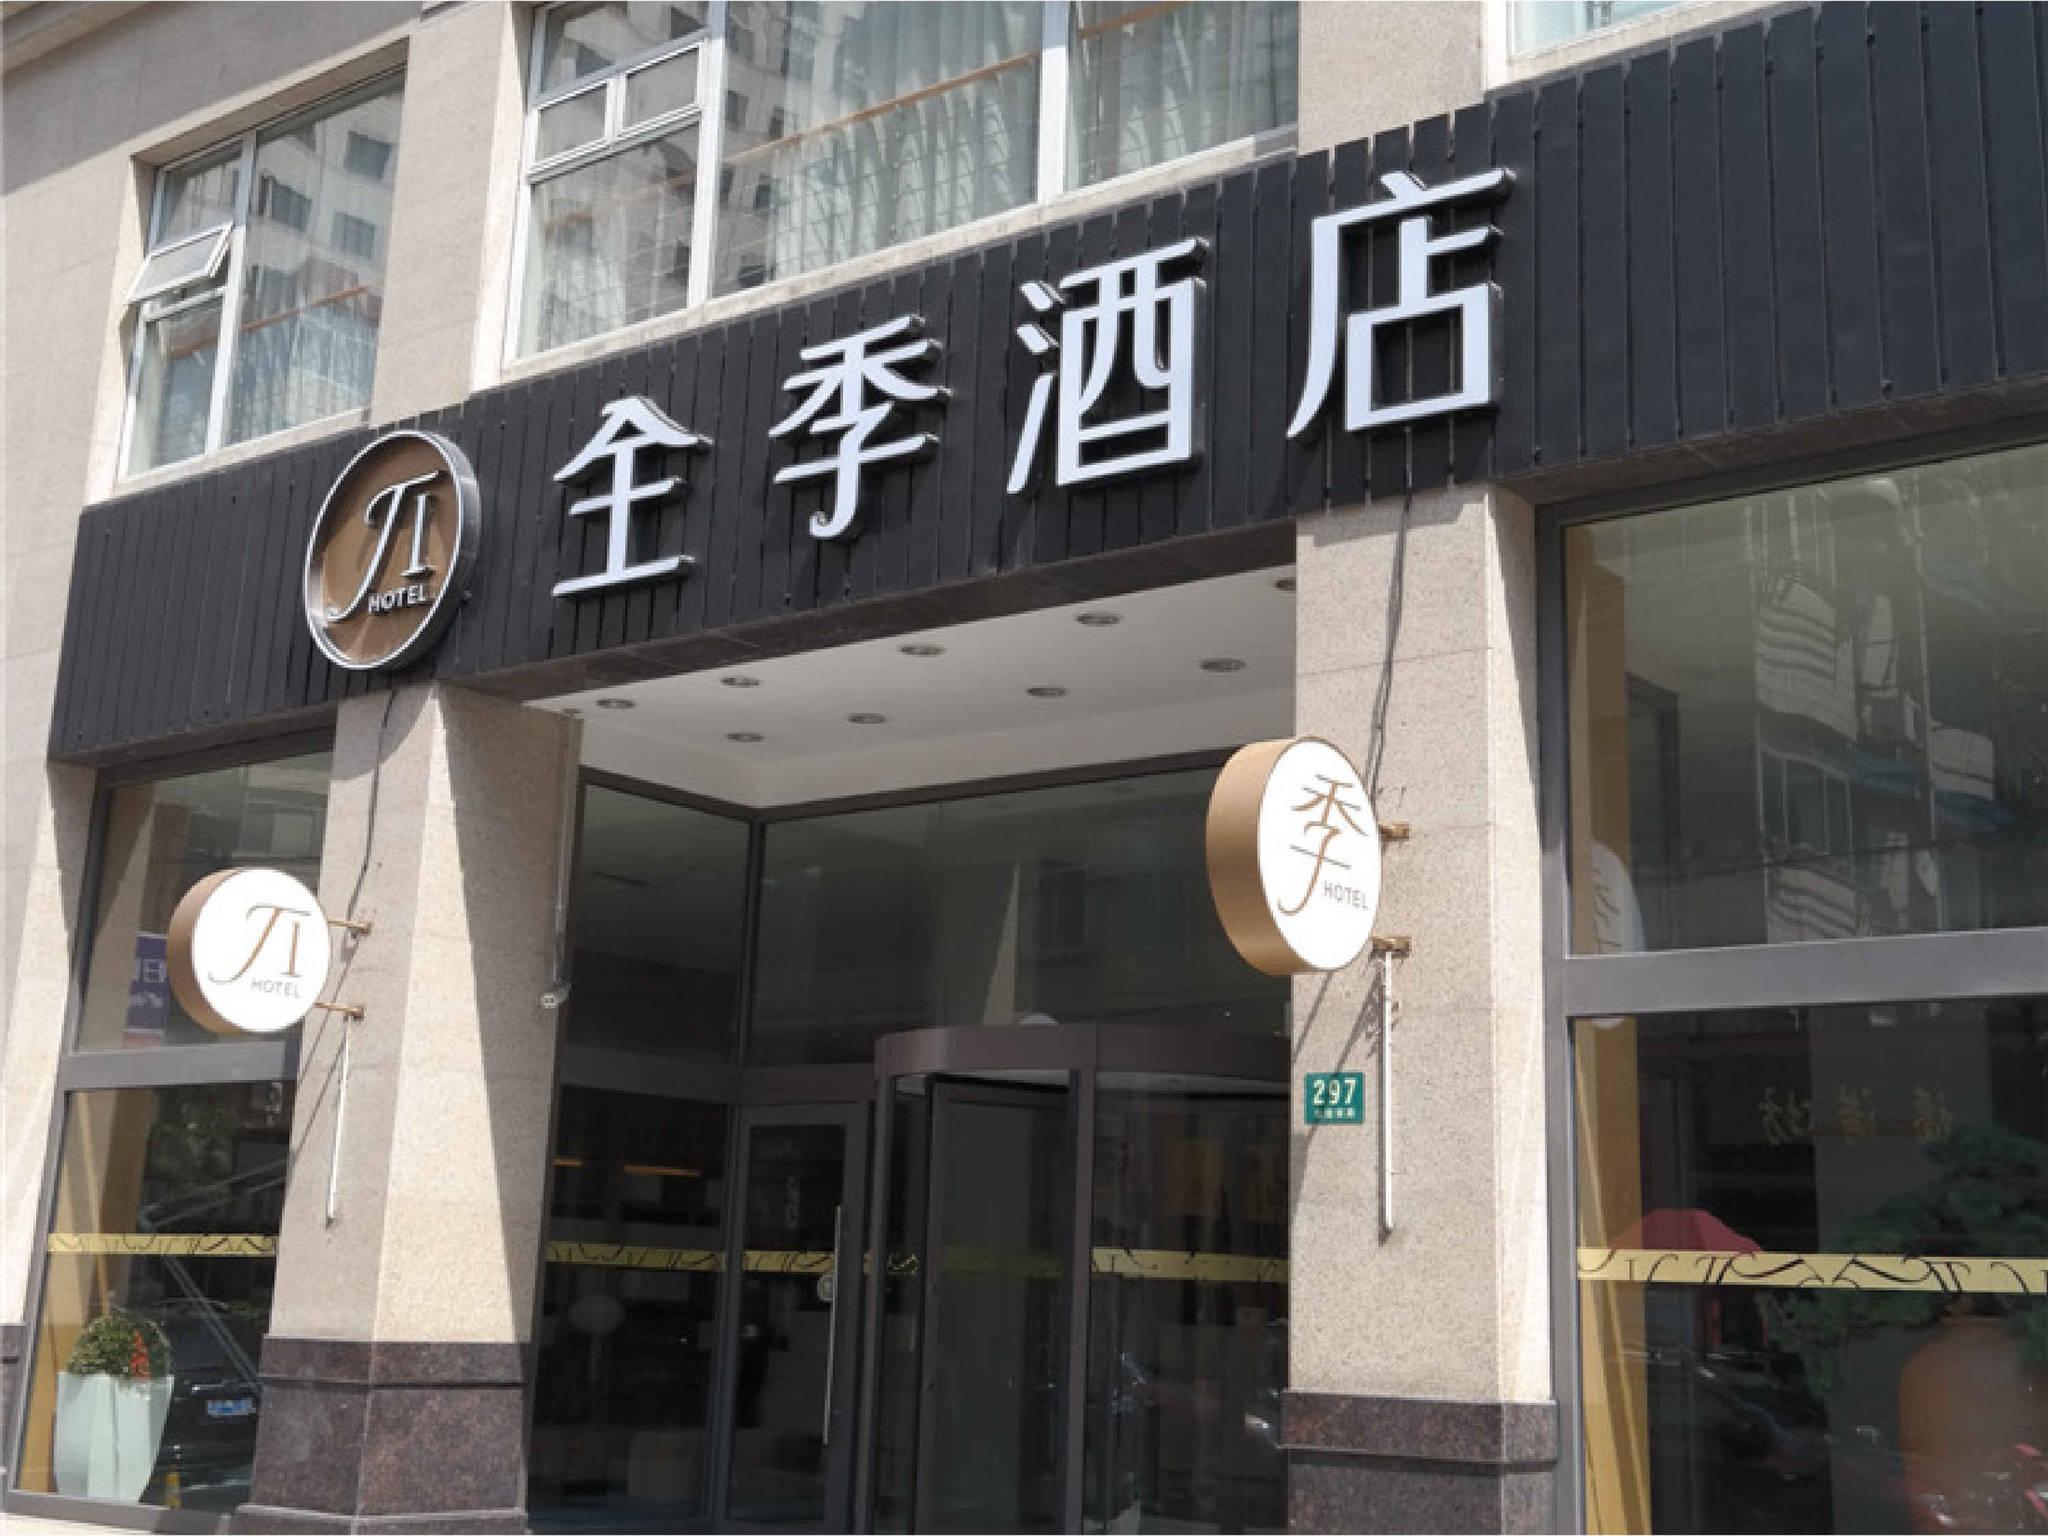 Hotel - Ji Hotel Shanghai Huaihai road